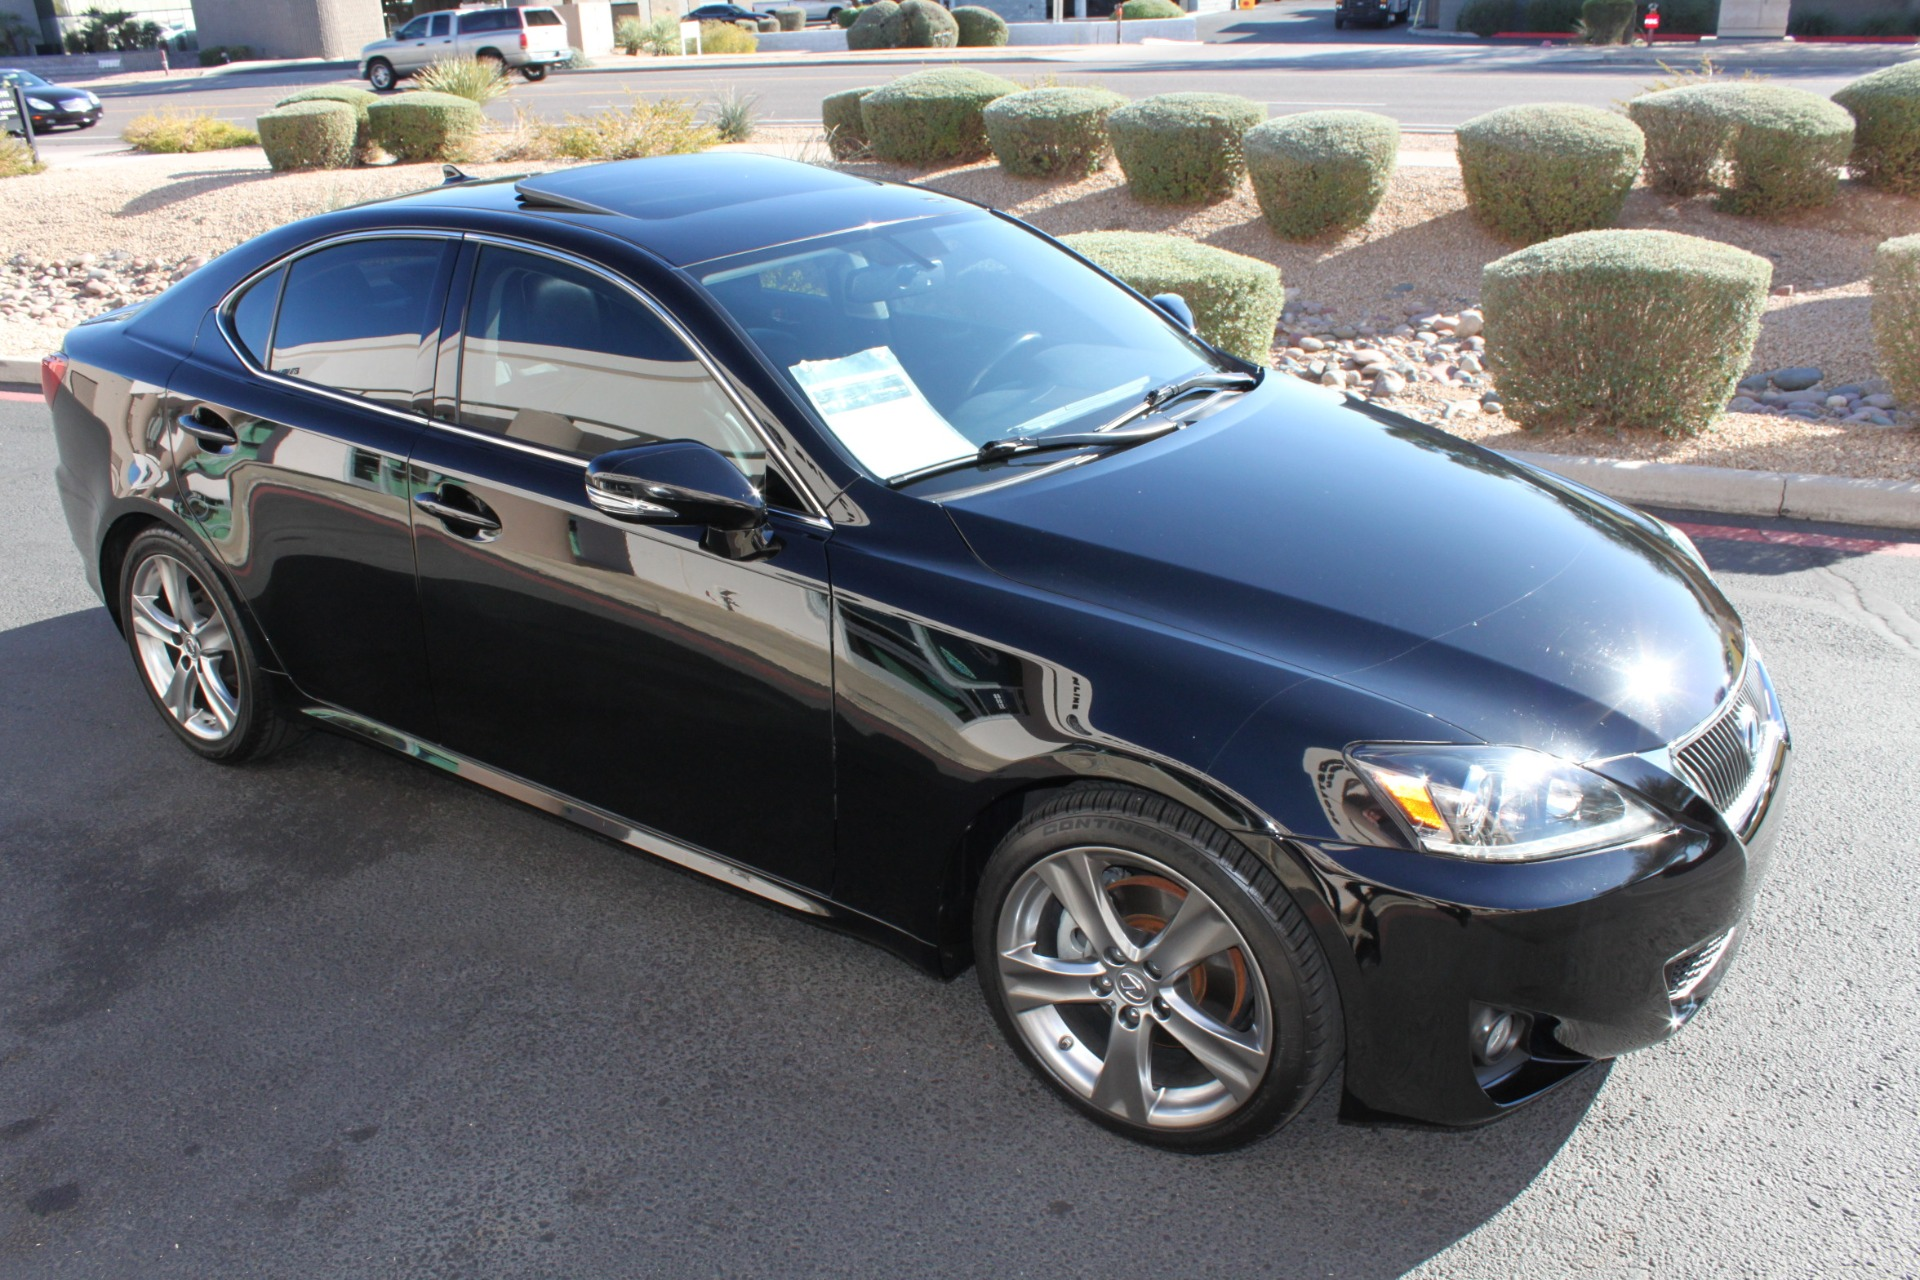 Used-2012-Lexus-IS-250-Fiat